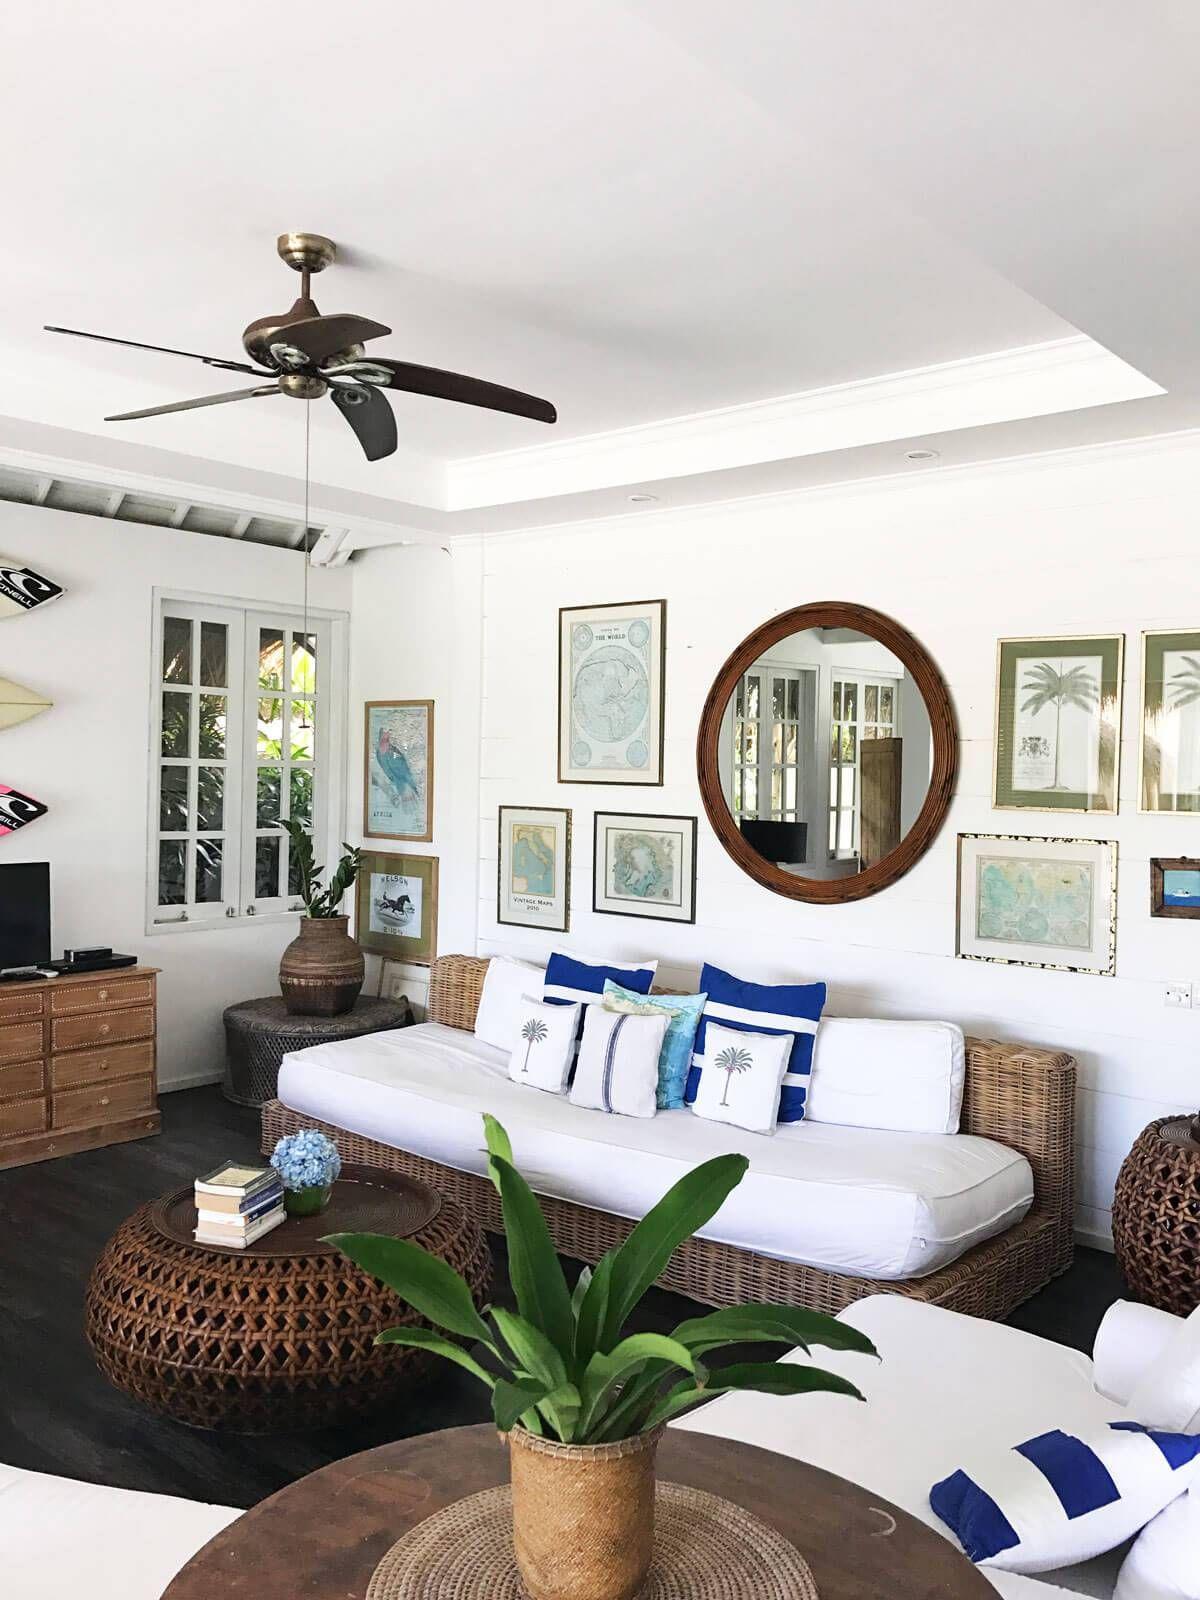 Beach Club Villa Bali We Like Bali Tropical Living Room Tropical Home Decor Tropical Houses